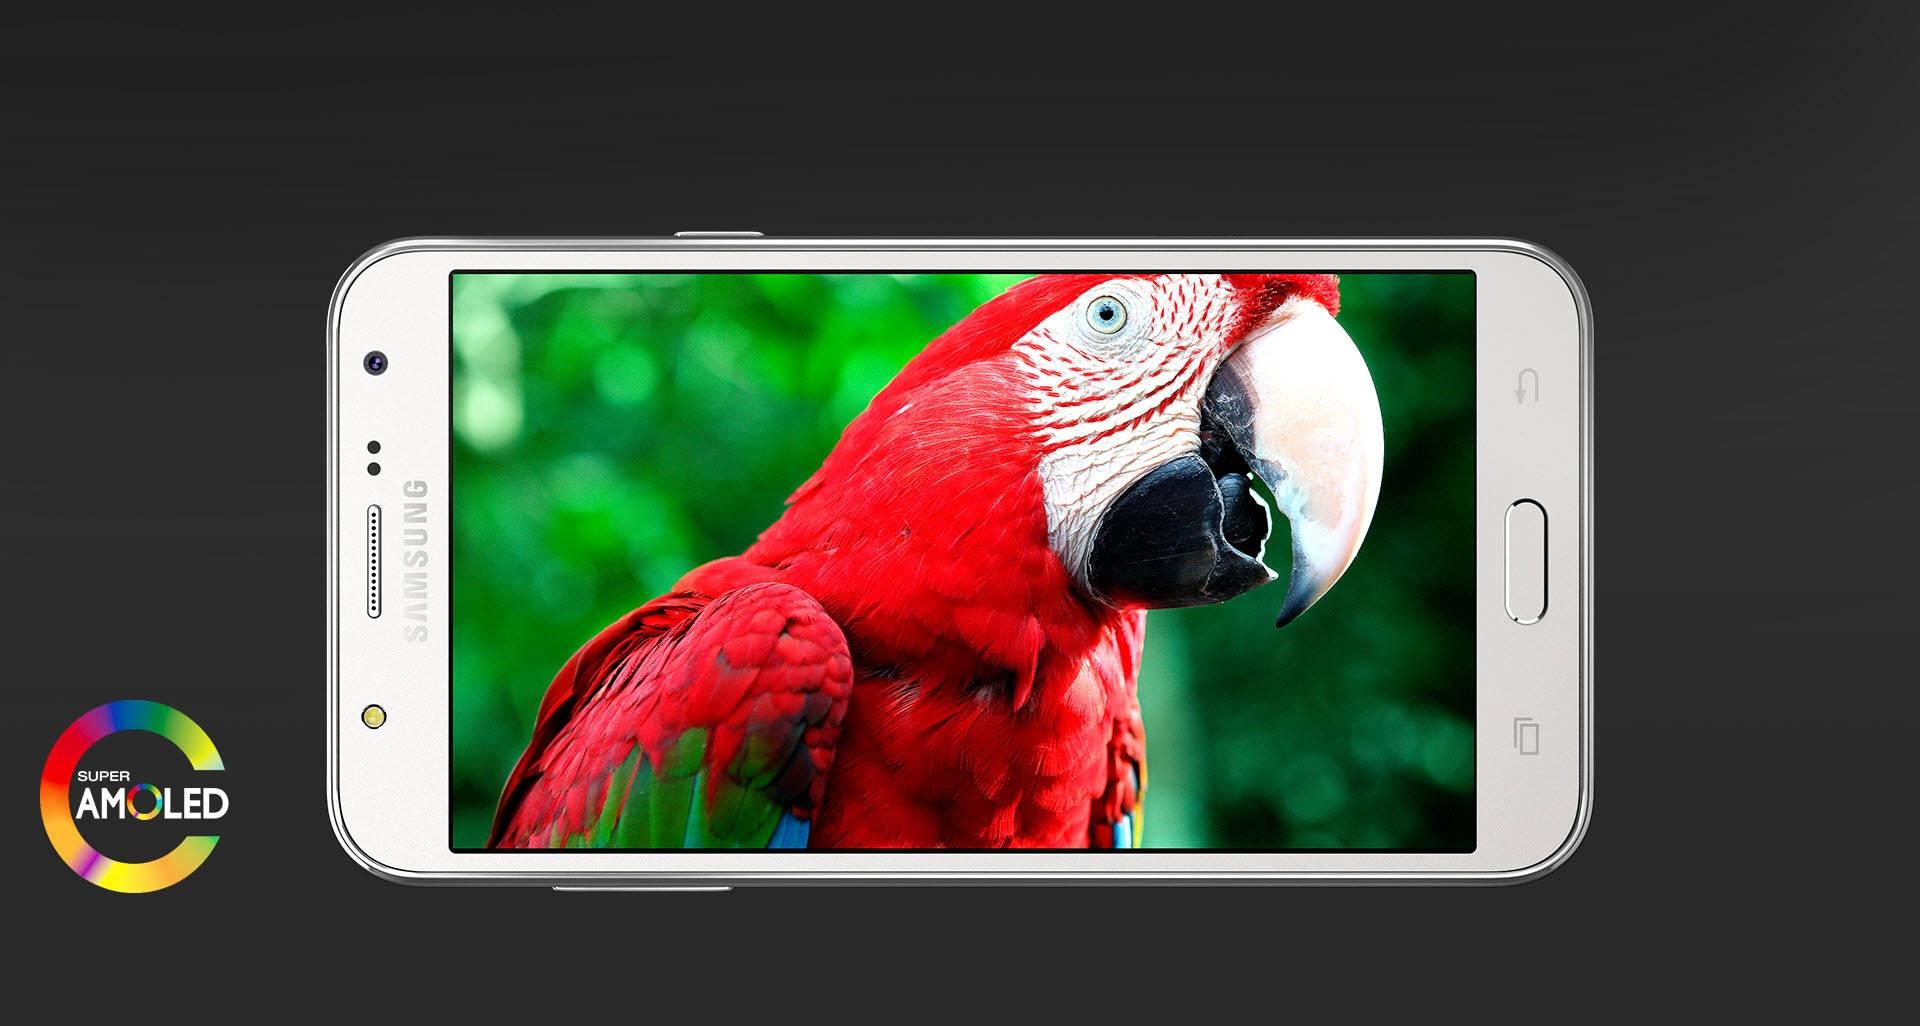 Samsung Galaxy J7 – Super AMOLED Display